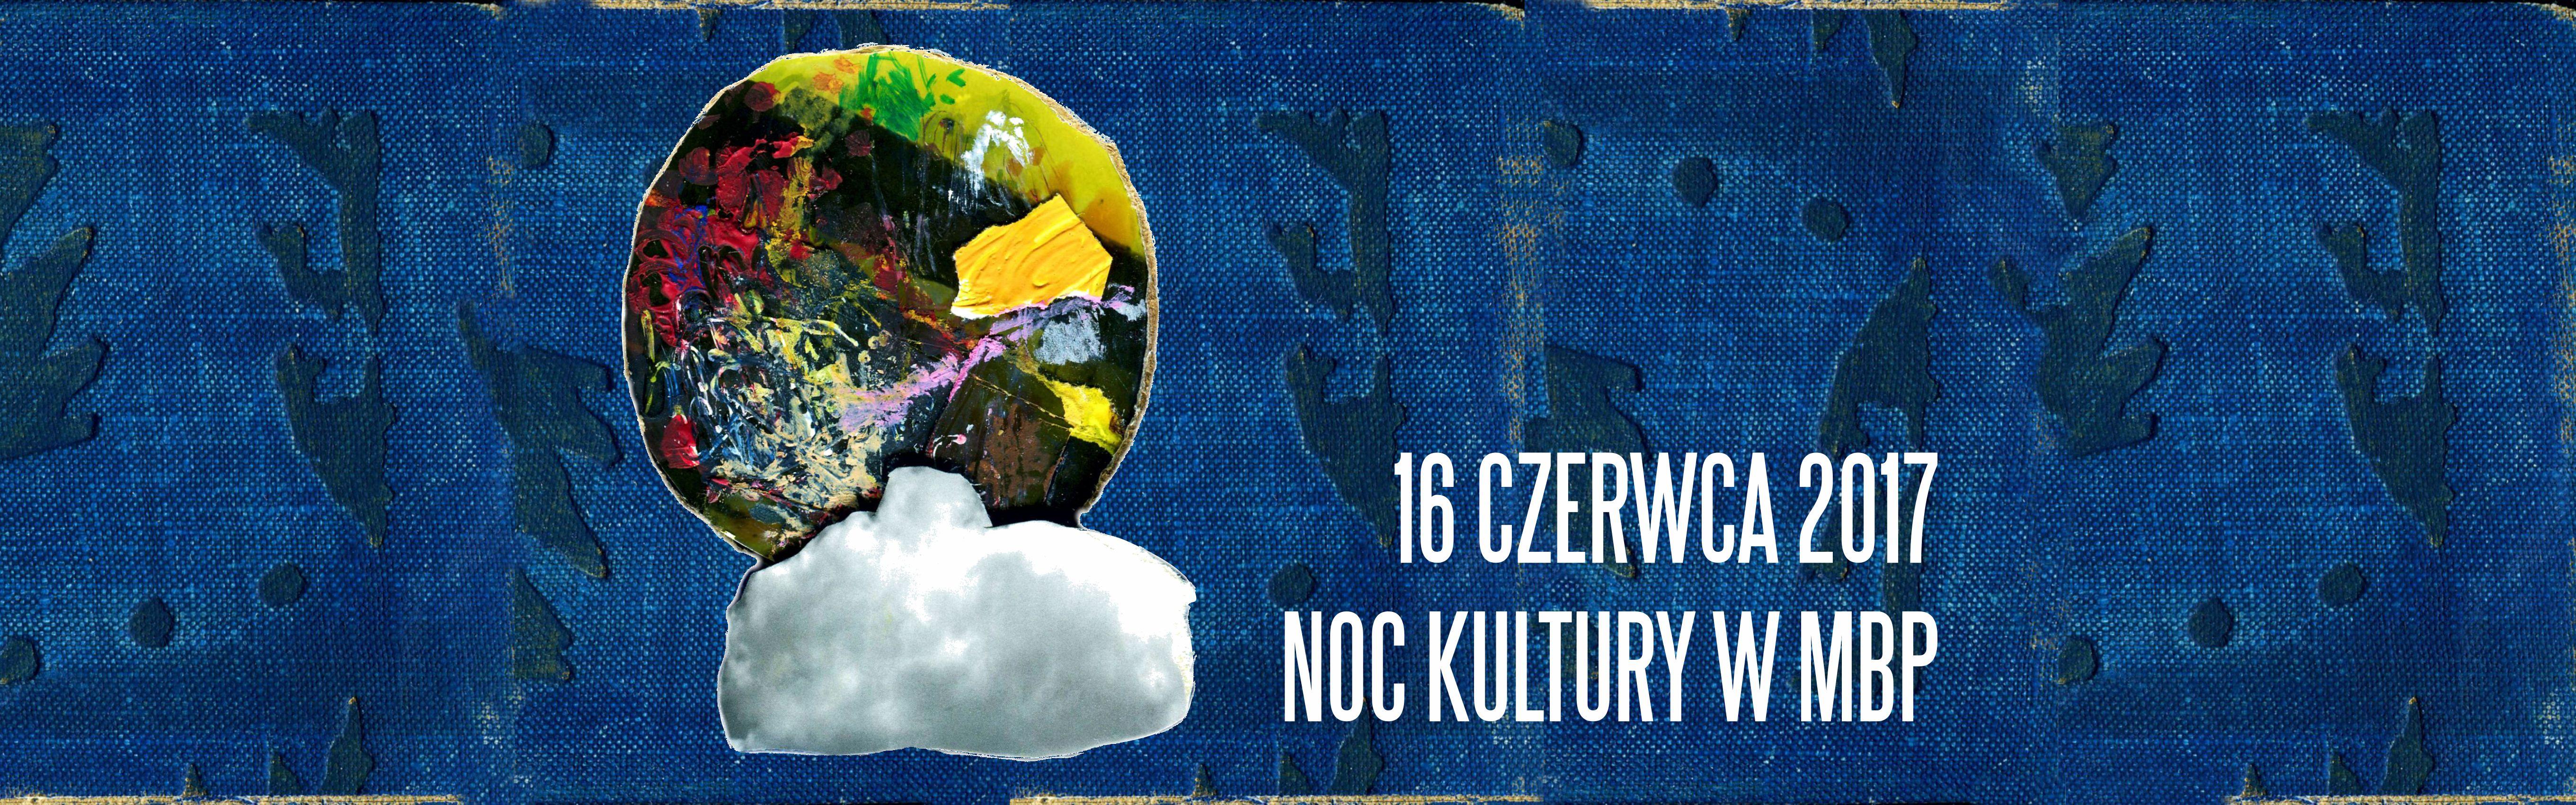 NOC KULTURY W MBP 2017